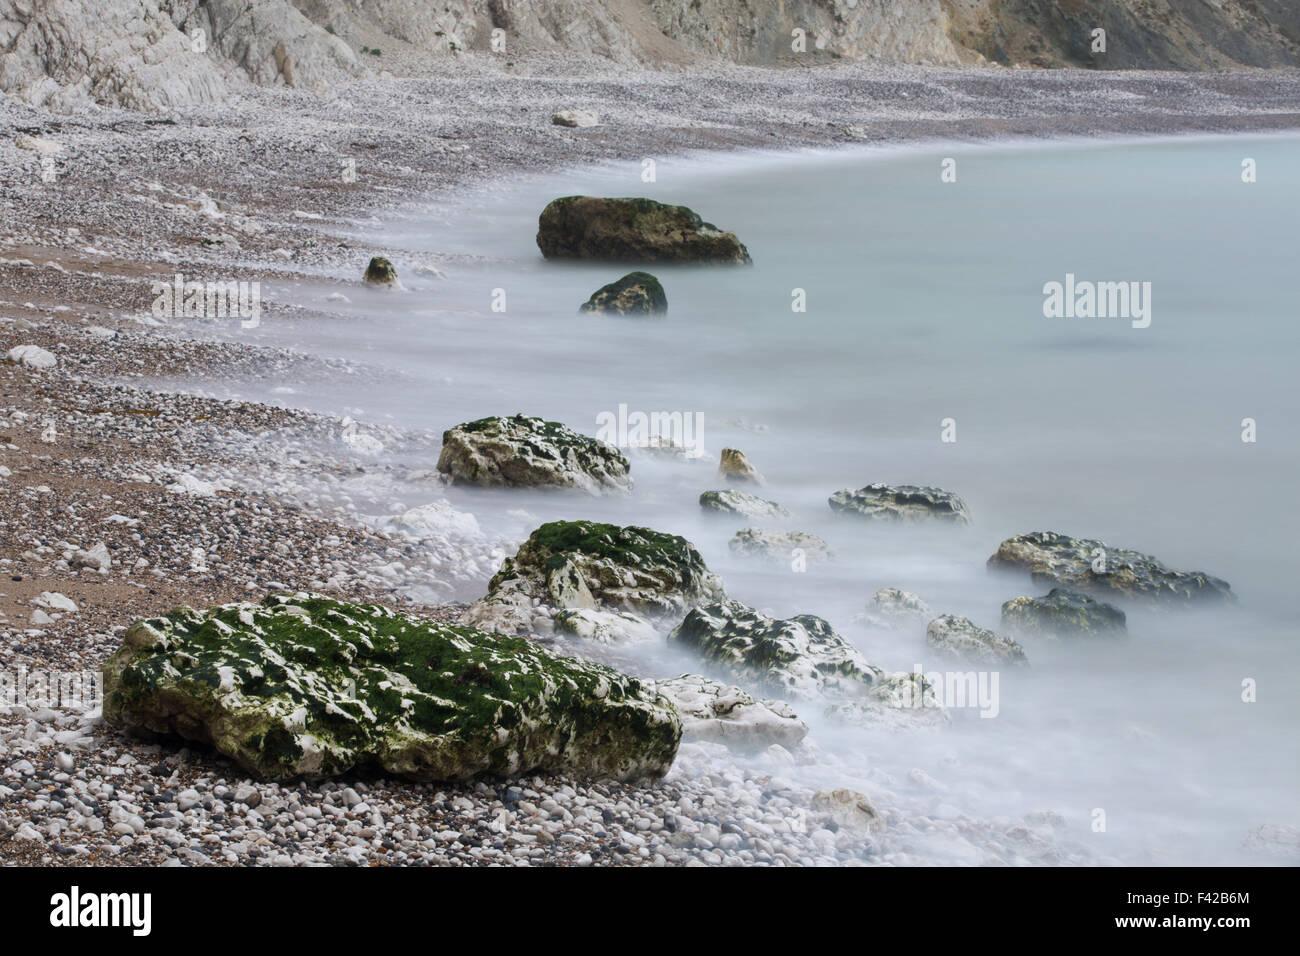 rocks on the beach at Lulworth Cove, Jurassic Coast, Dorset, England, UK - Stock Image